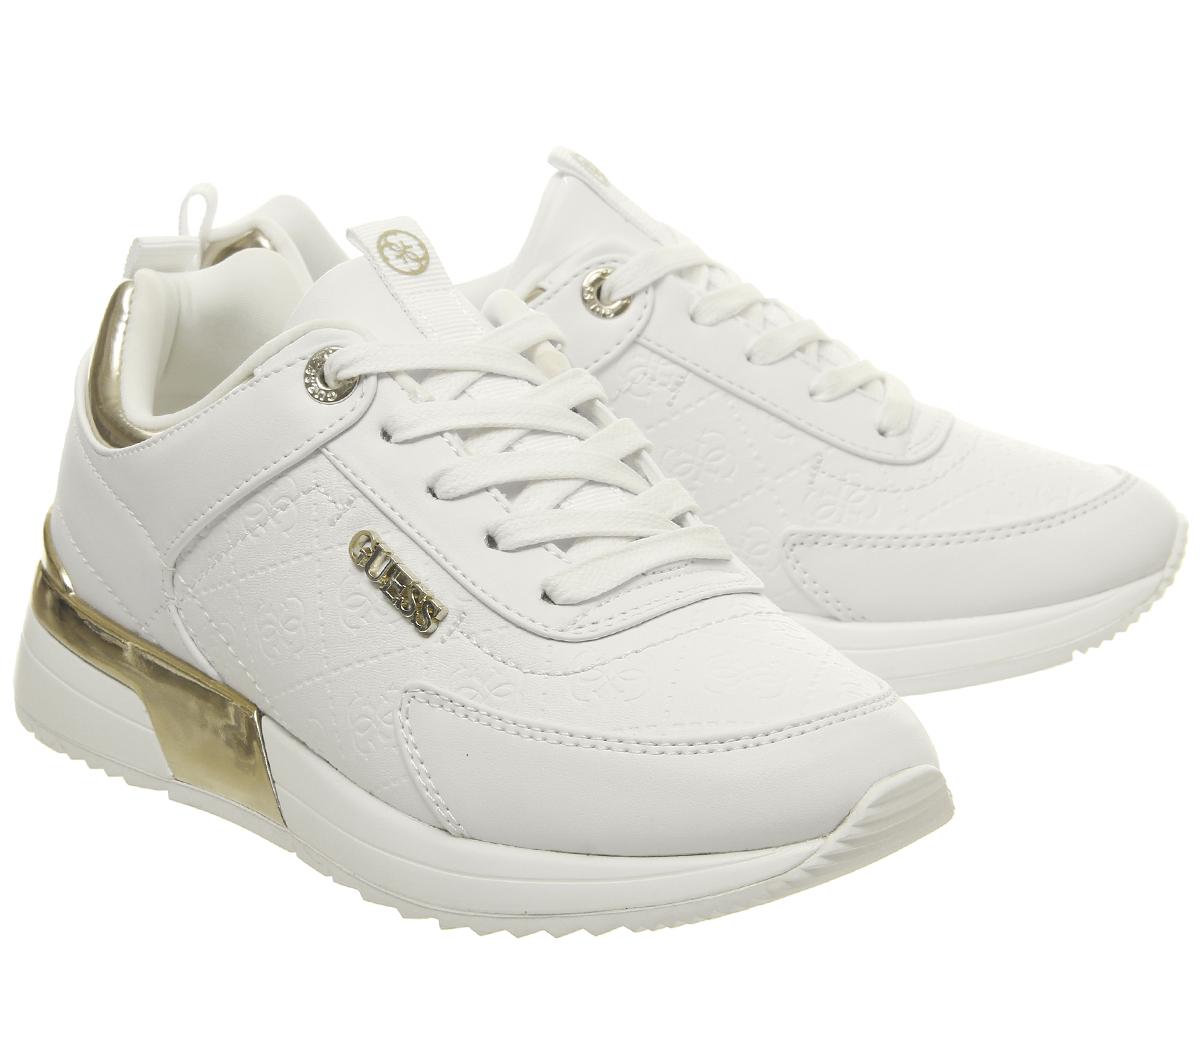 Womens Guess Guess Guess Marlyn Sneakers White gold Flats 1c0da8